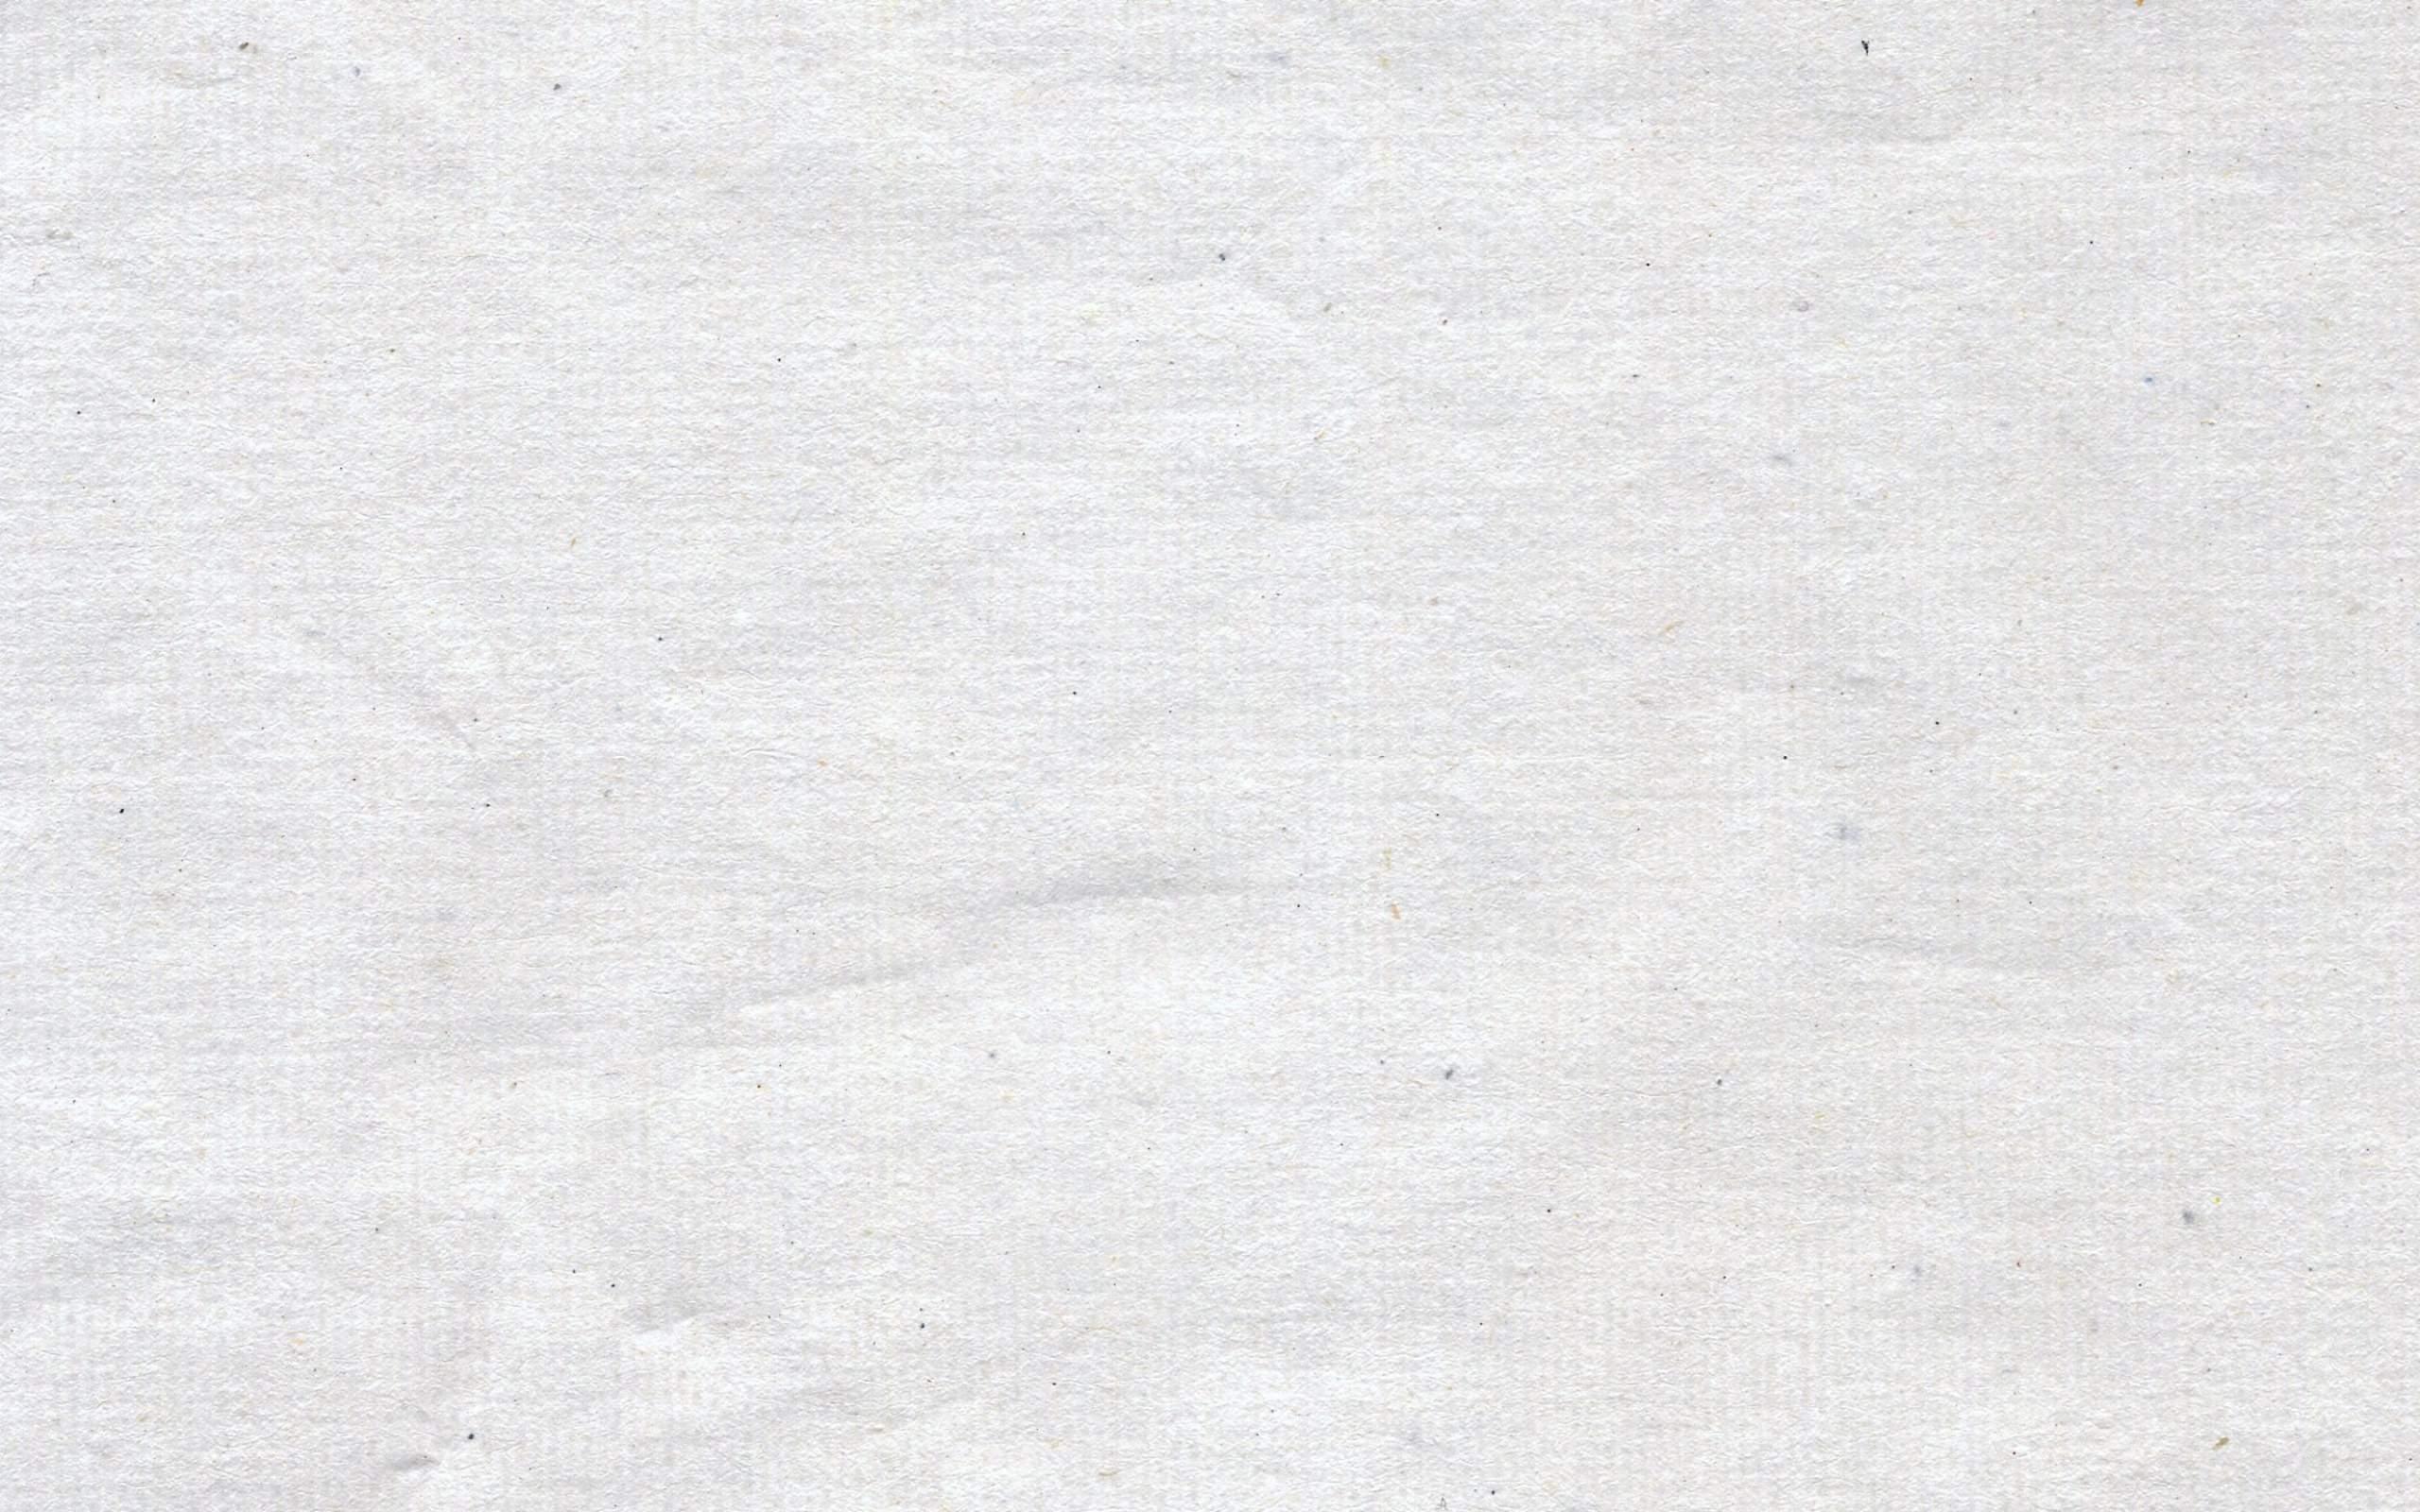 White Bumps Background